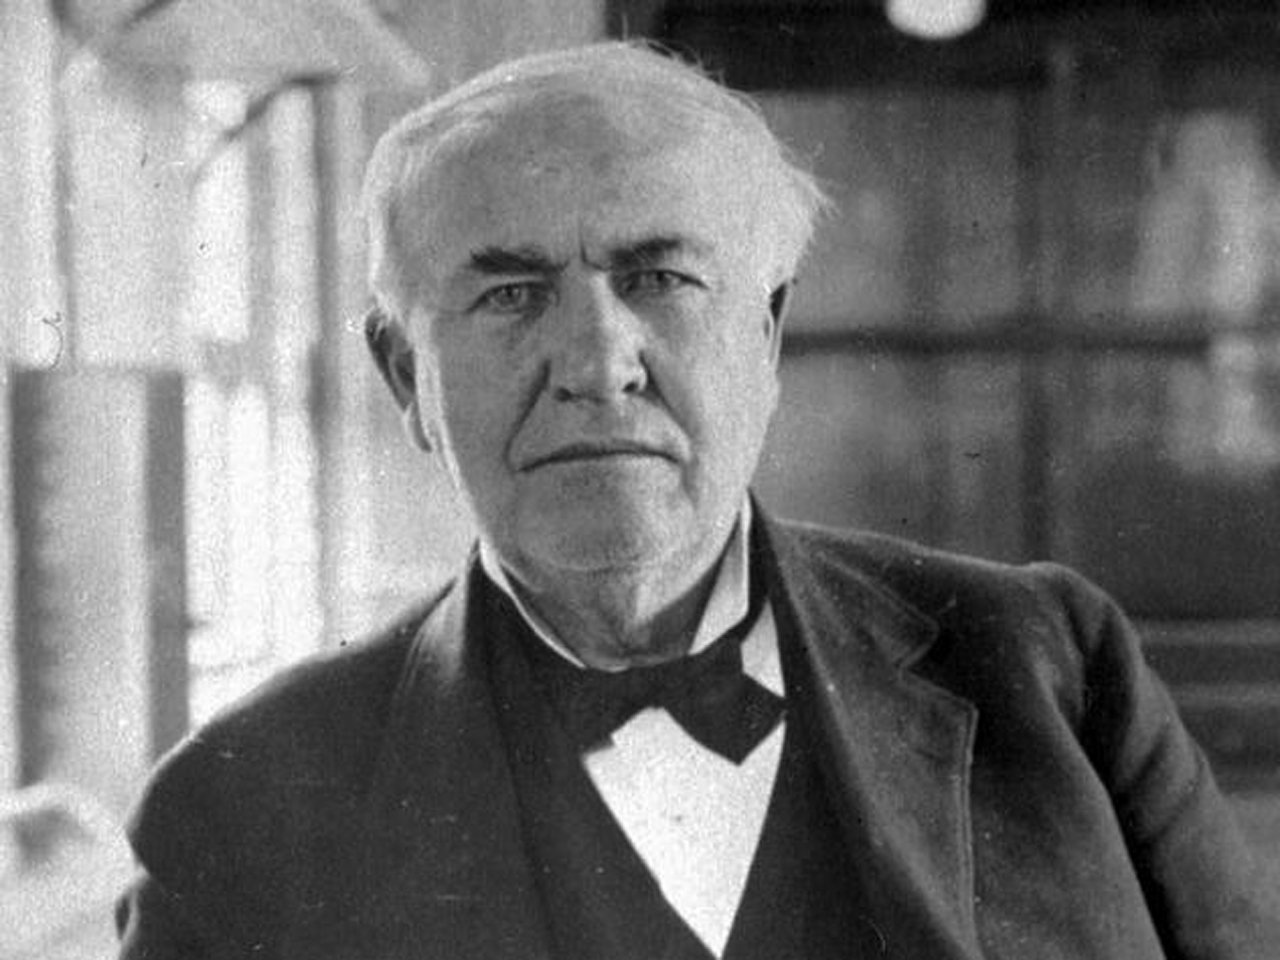 Thomas Edison Hologram Chats At Detroit Auto Show Cbs News